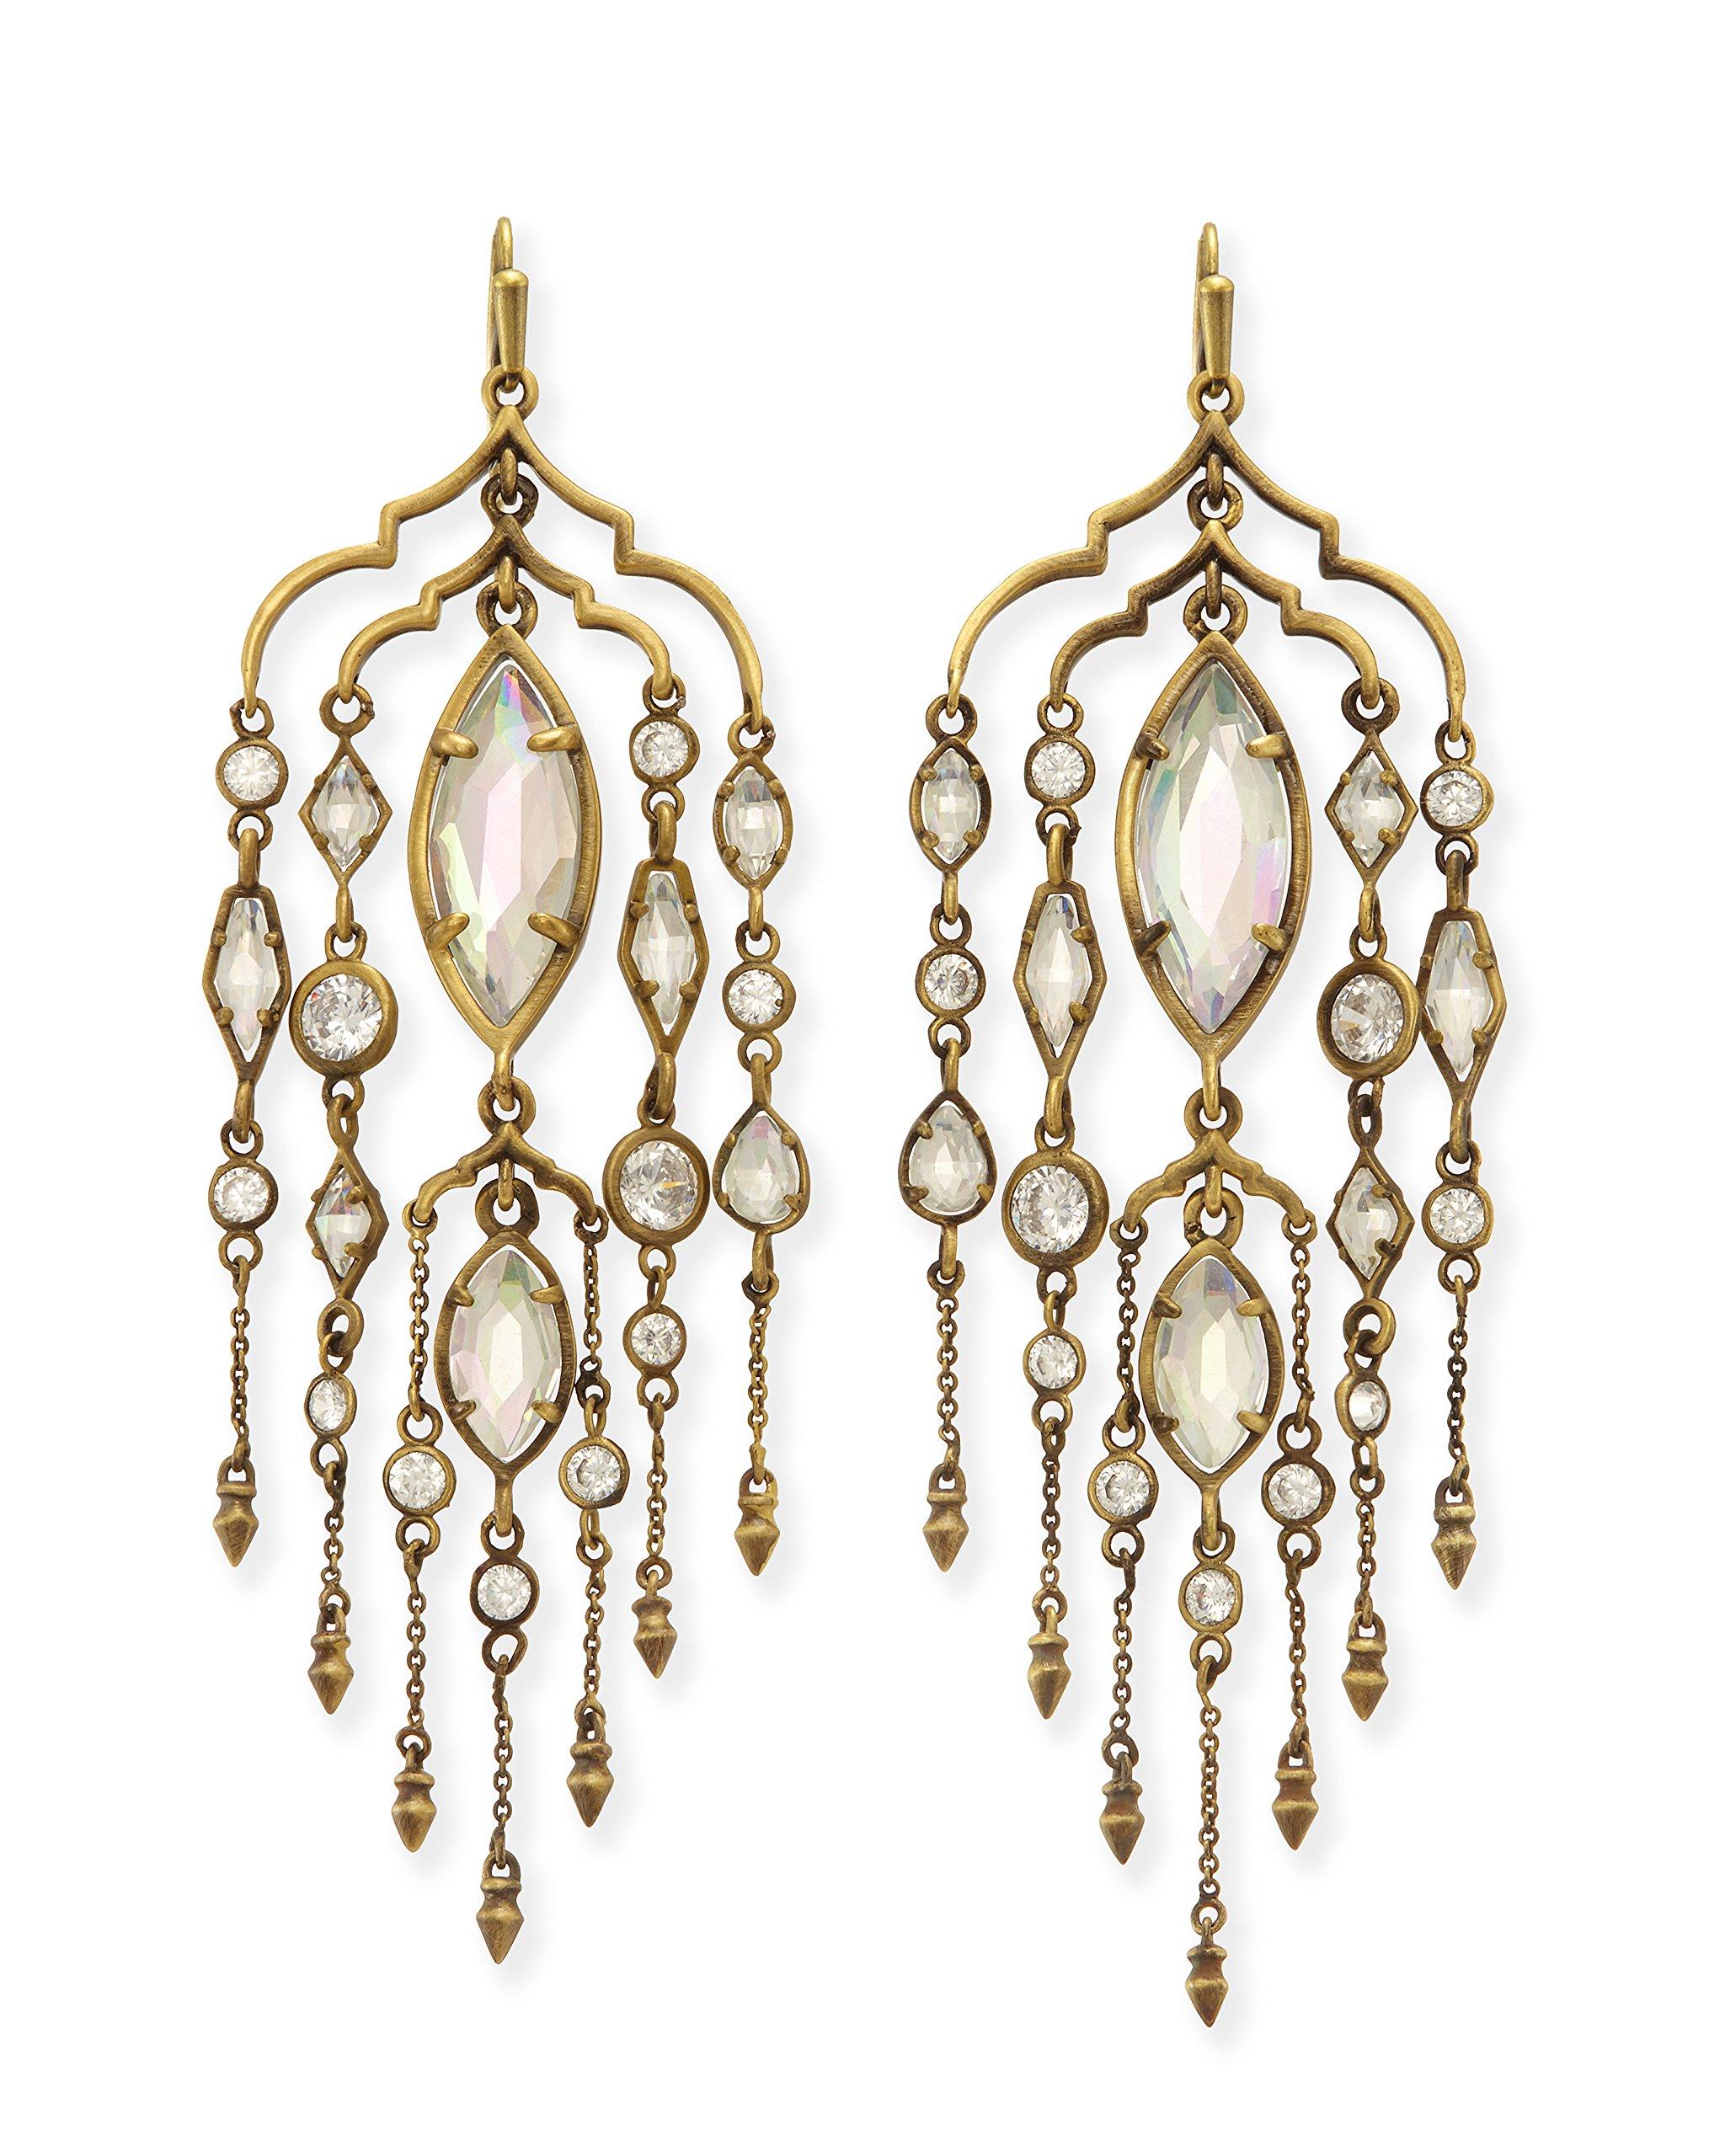 Kendra Scott Emma Shoulder Duster Earrings in Antique Brass Iridescent Glass and Cubic Zirconia by Kendra Scott